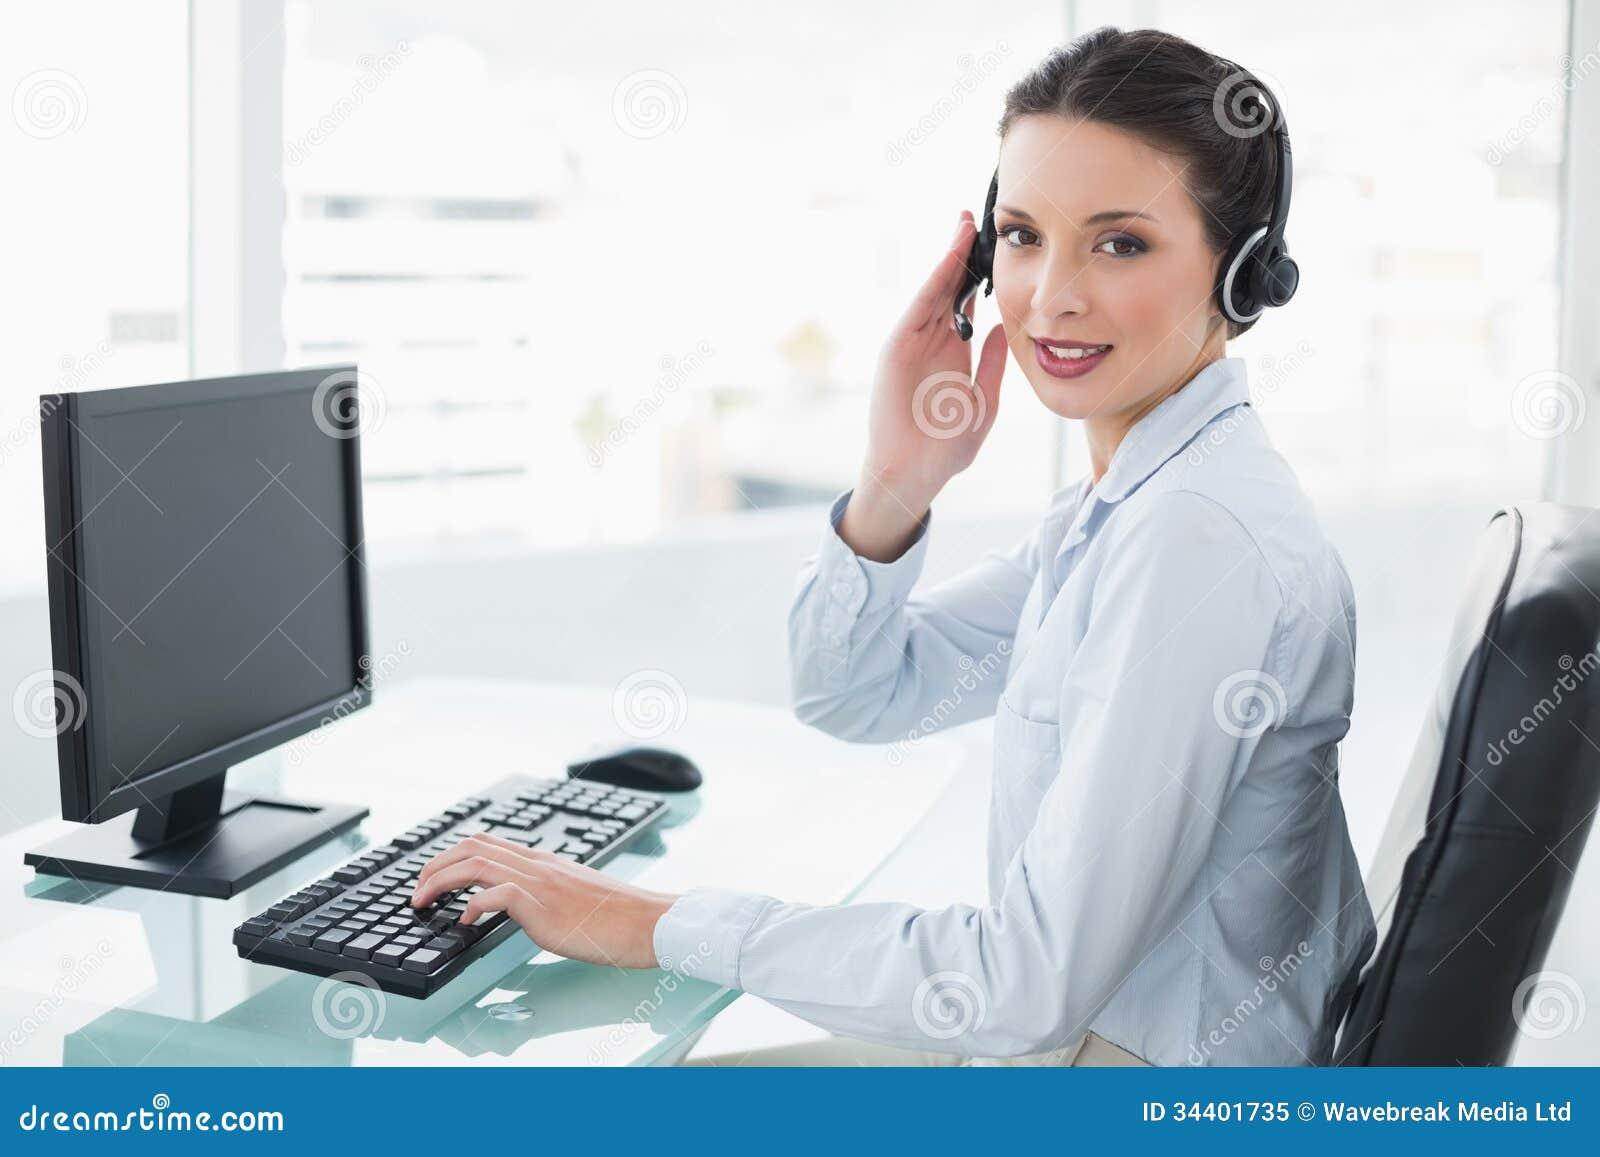 pretty stylish brunette operator using a computer and